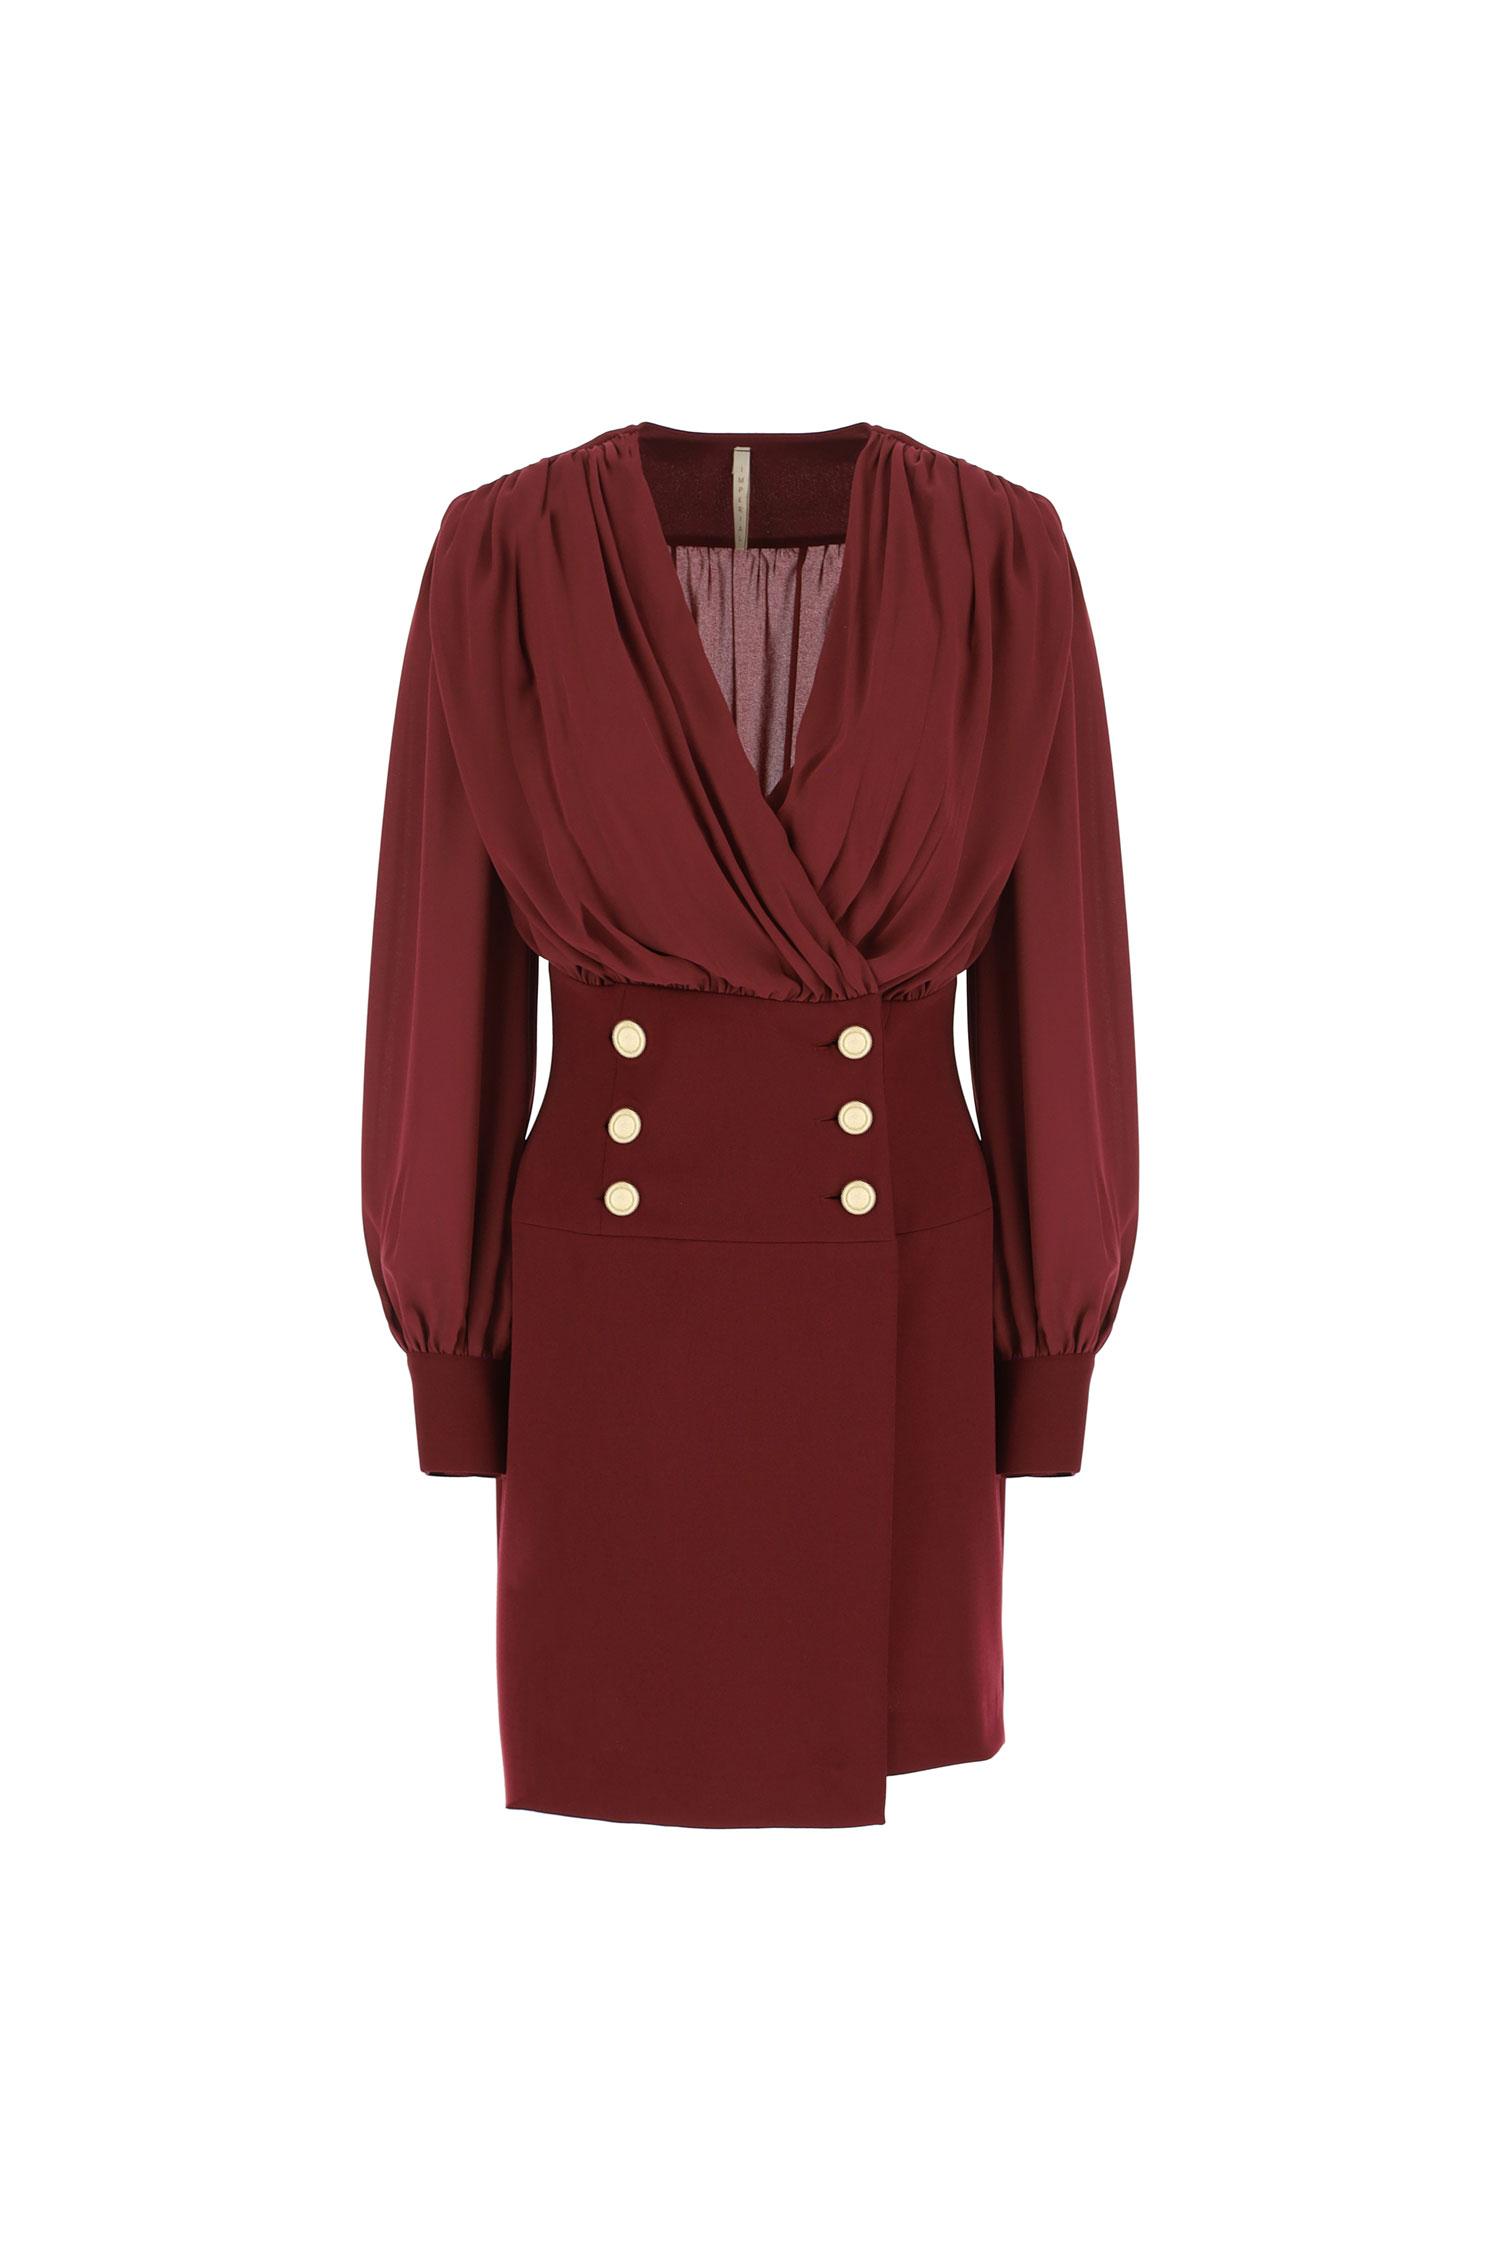 IMPERIAL | Dress  | ABHTAEG1469